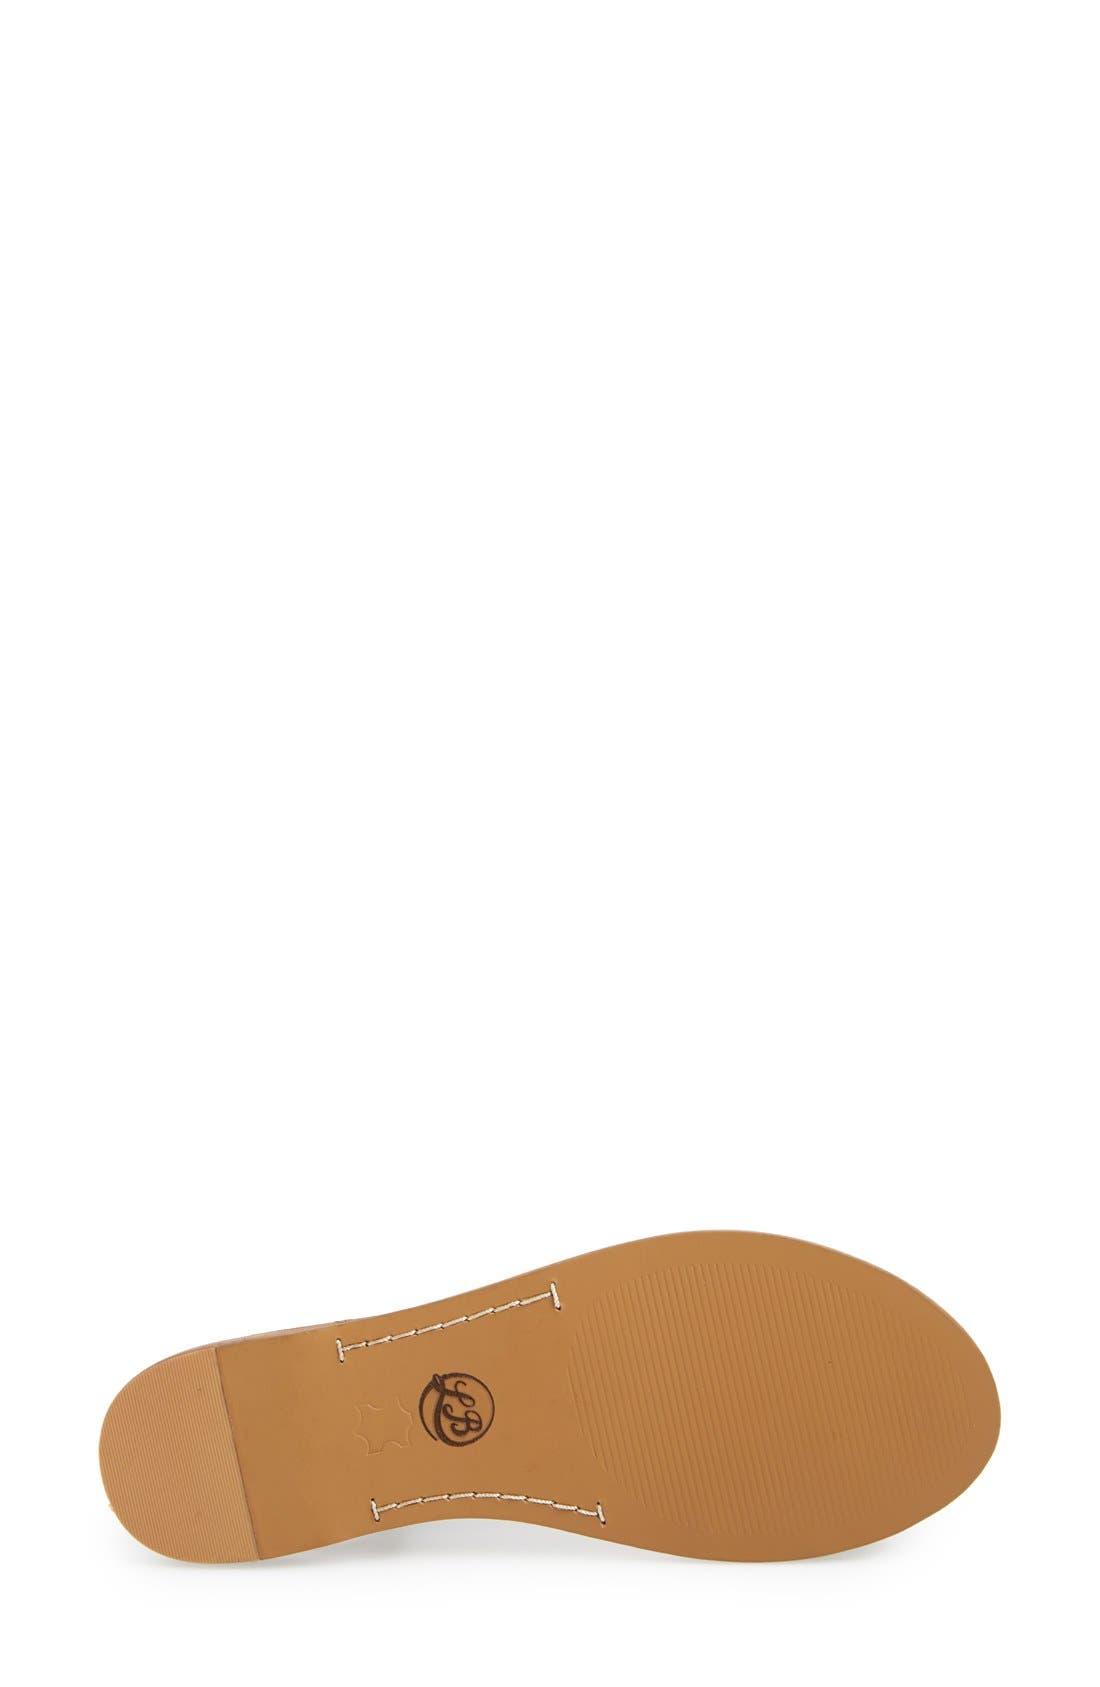 'Adivita' Sandal,                             Alternate thumbnail 4, color,                             200